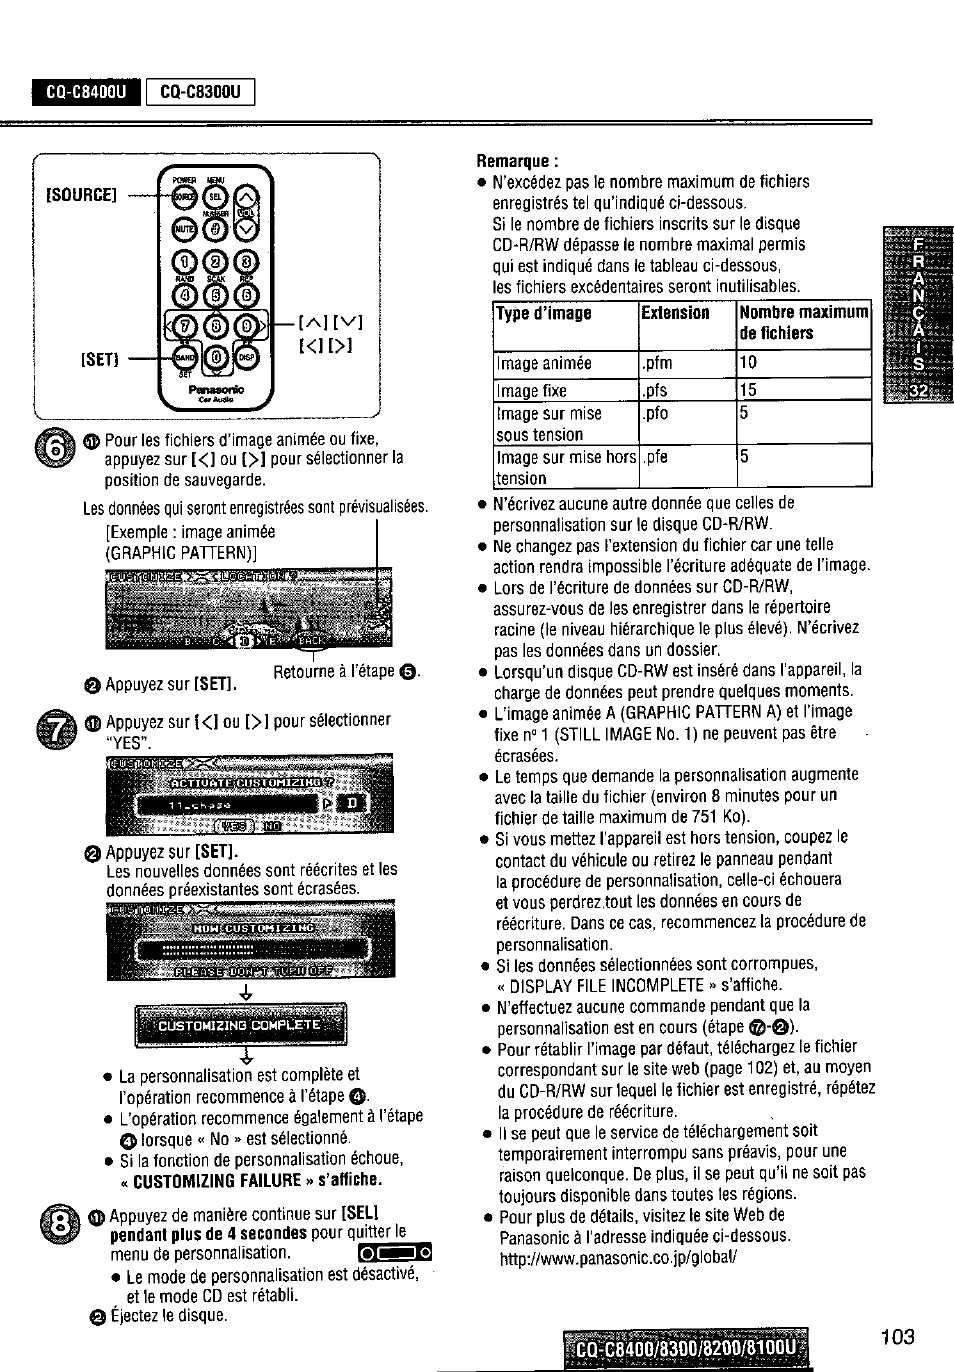 cq-c8400u, remarque, p1=e | panasonic cq-c8300u user manual